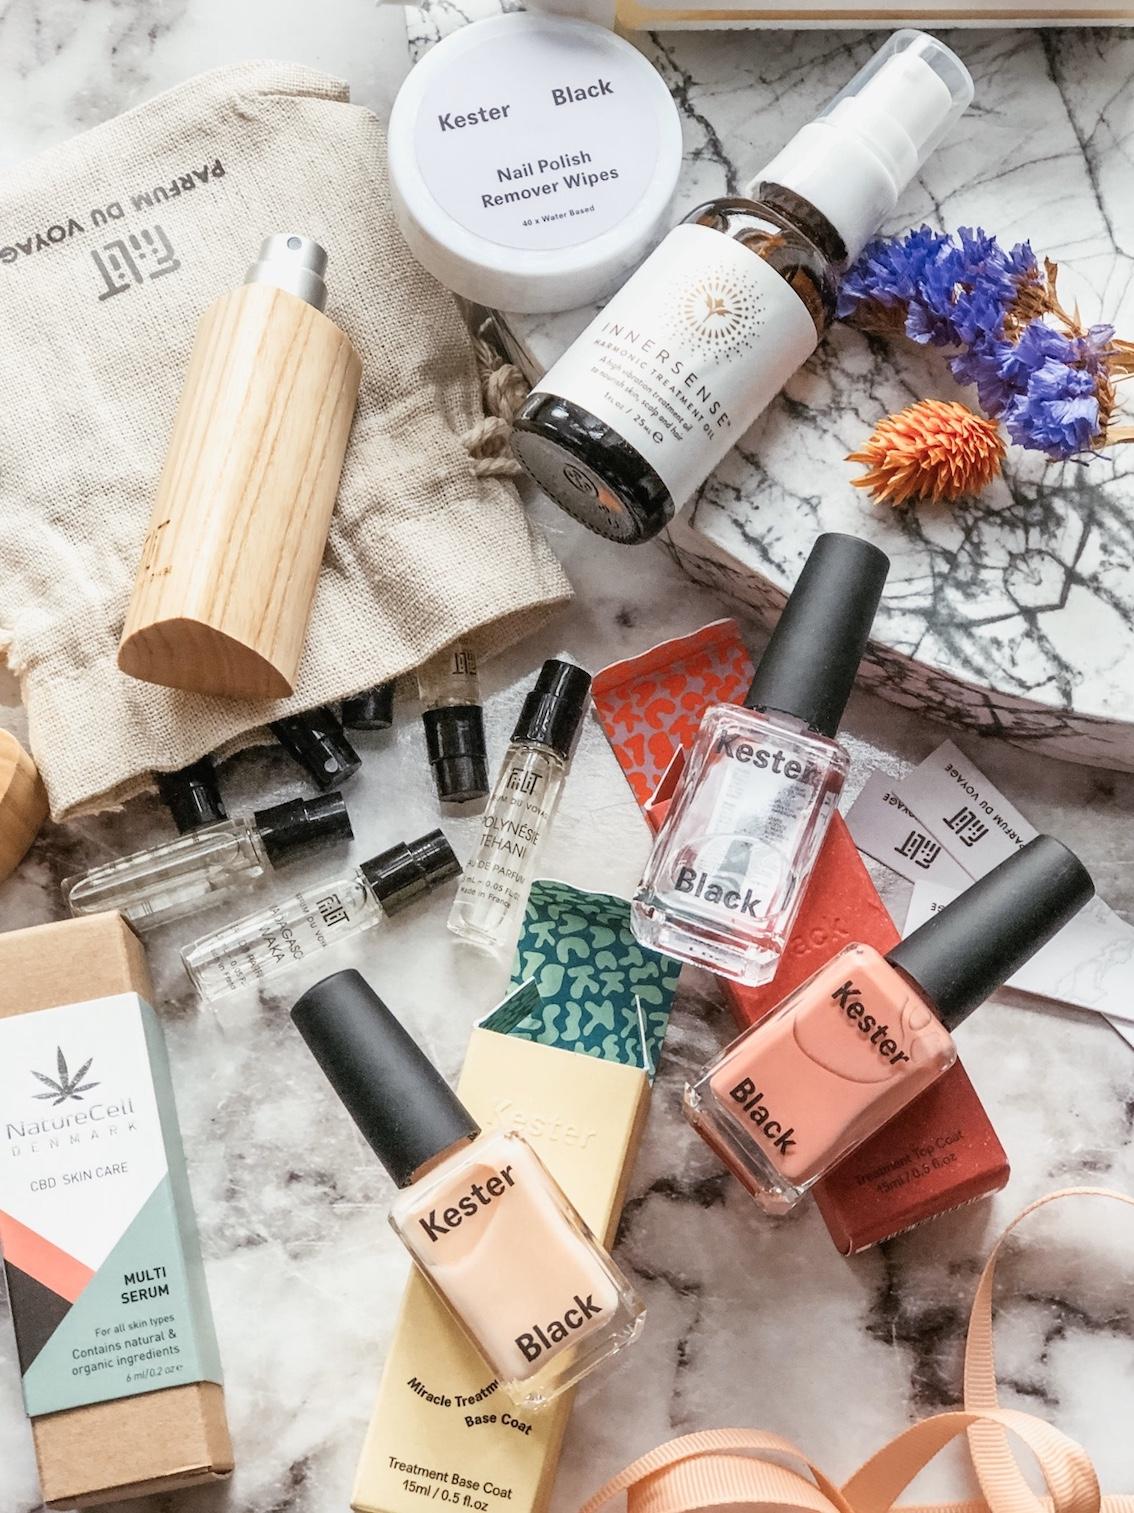 kester black fiilit parfum du voyage innersense Nature Cell CBD skin care urbannotes.dk